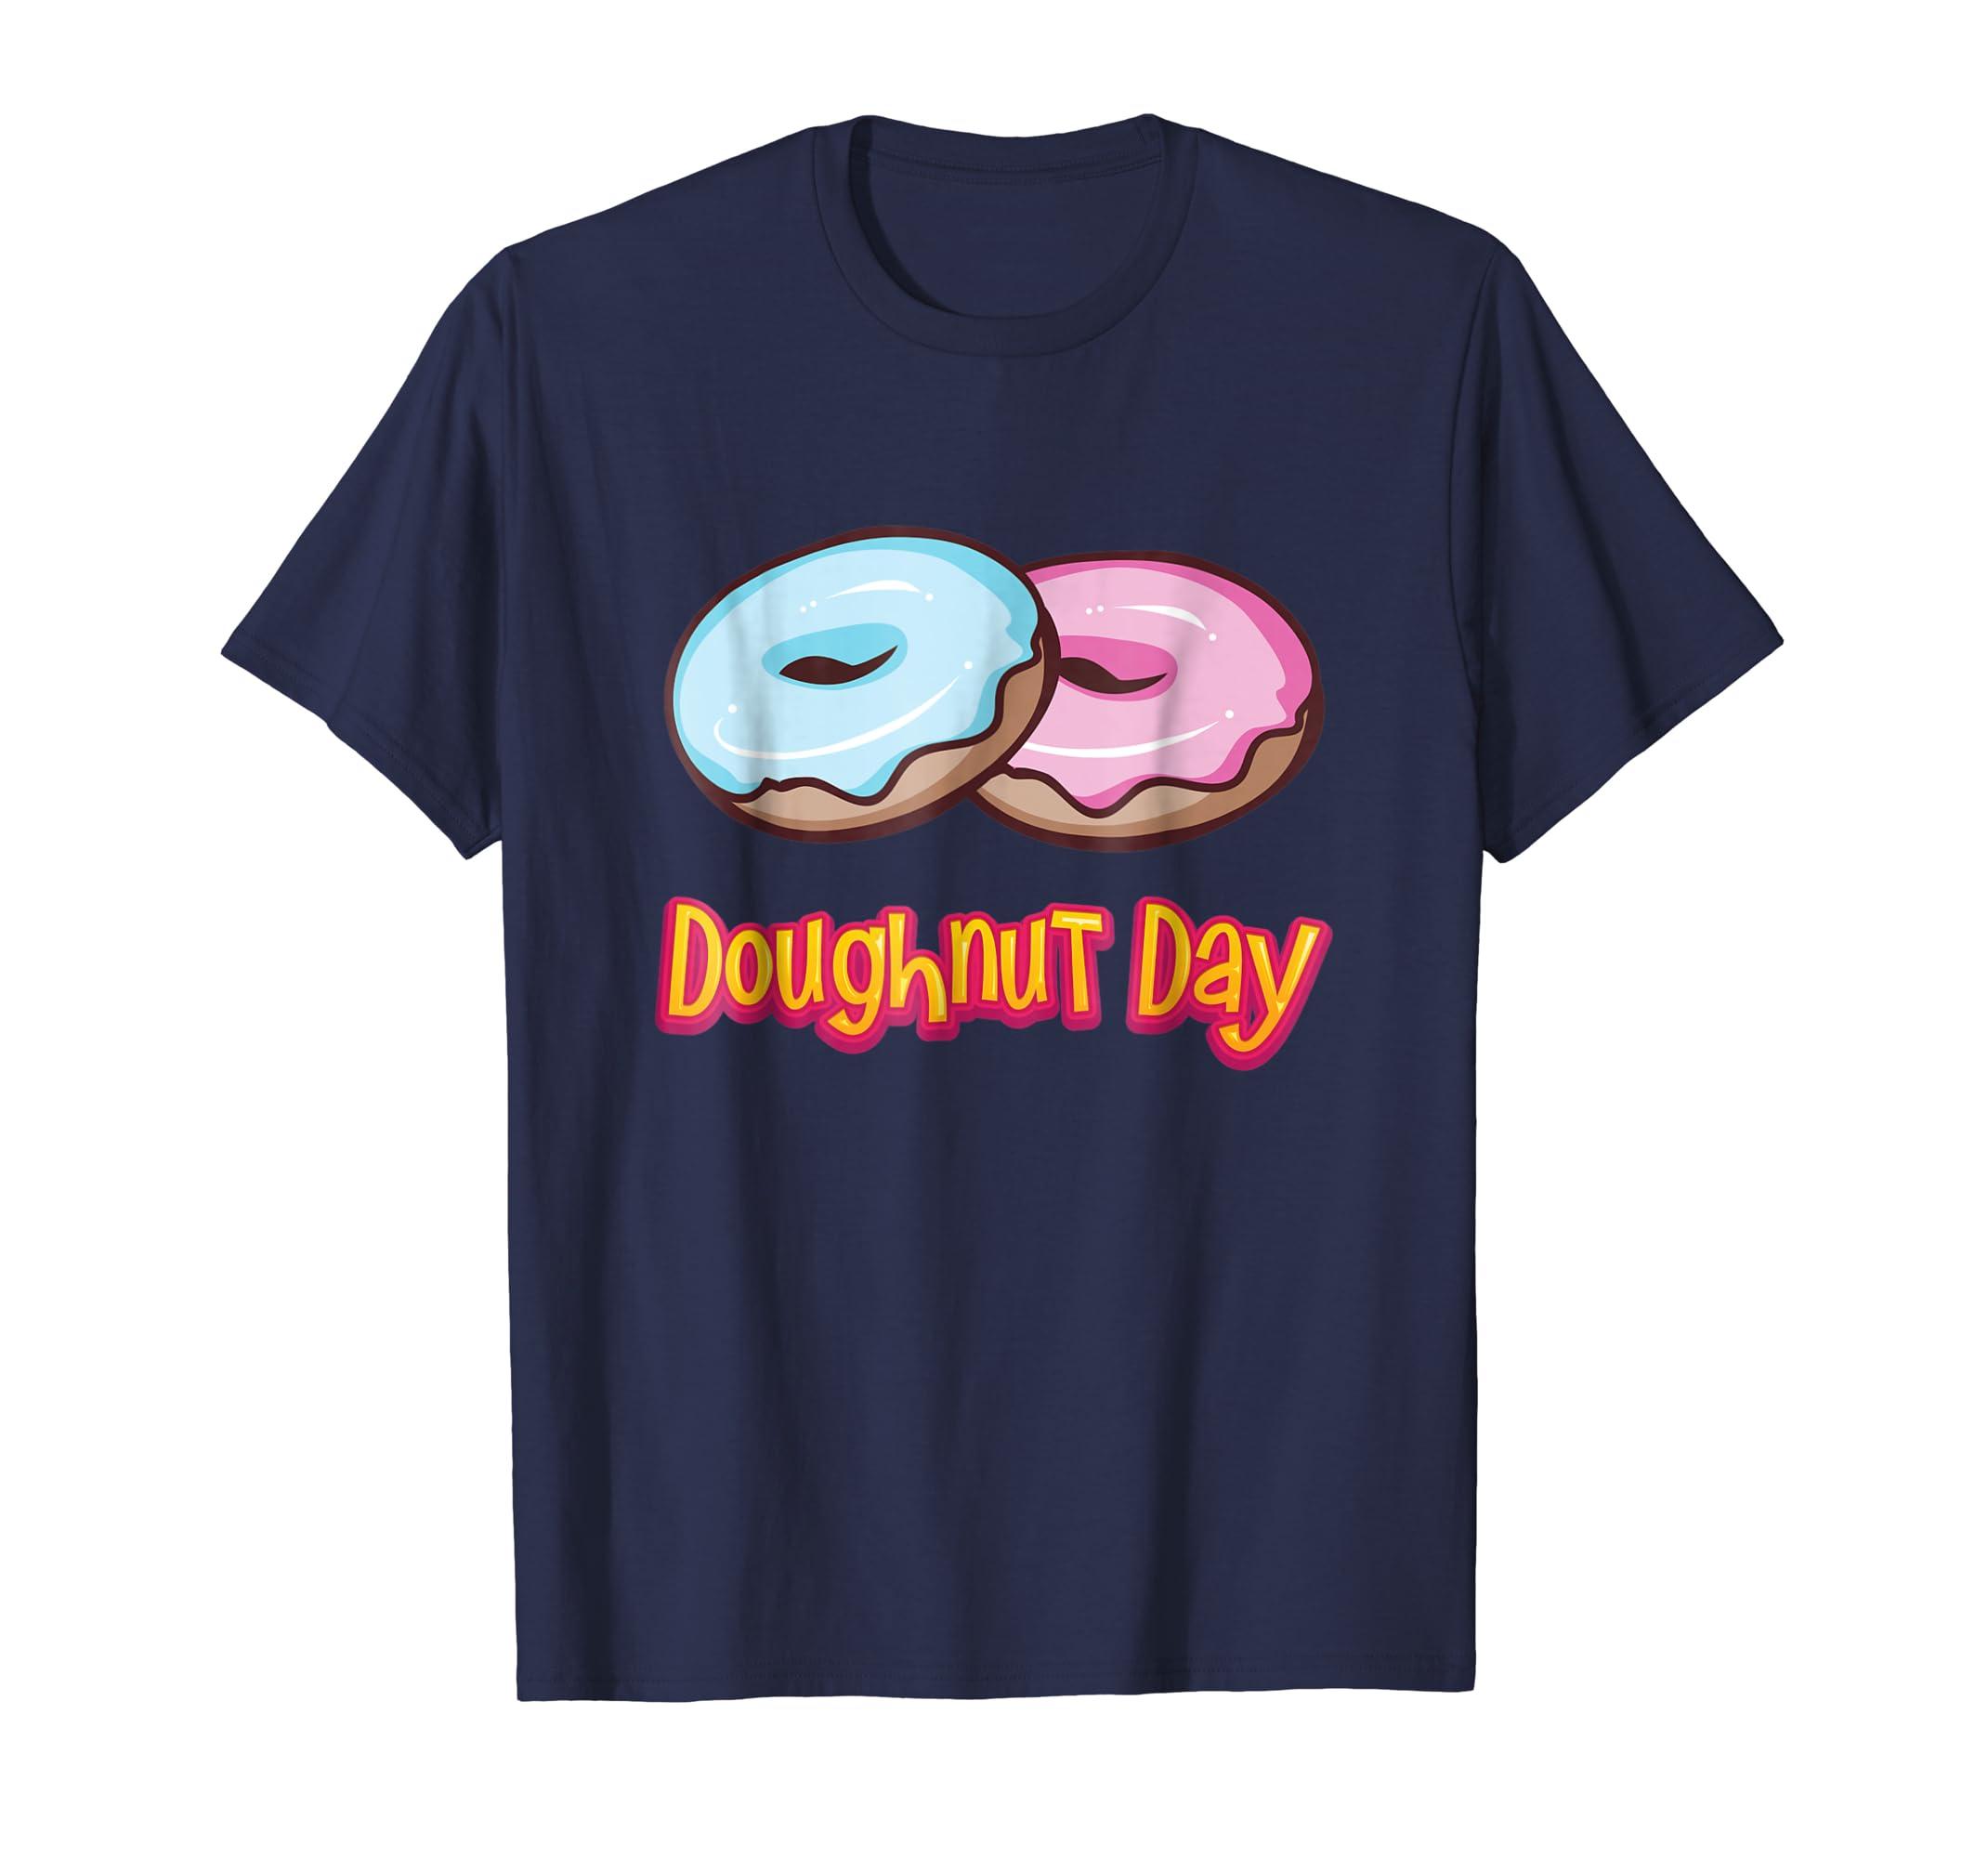 'Doughnut Day' Sweet National Doughnut Day Food Shirt-AZP